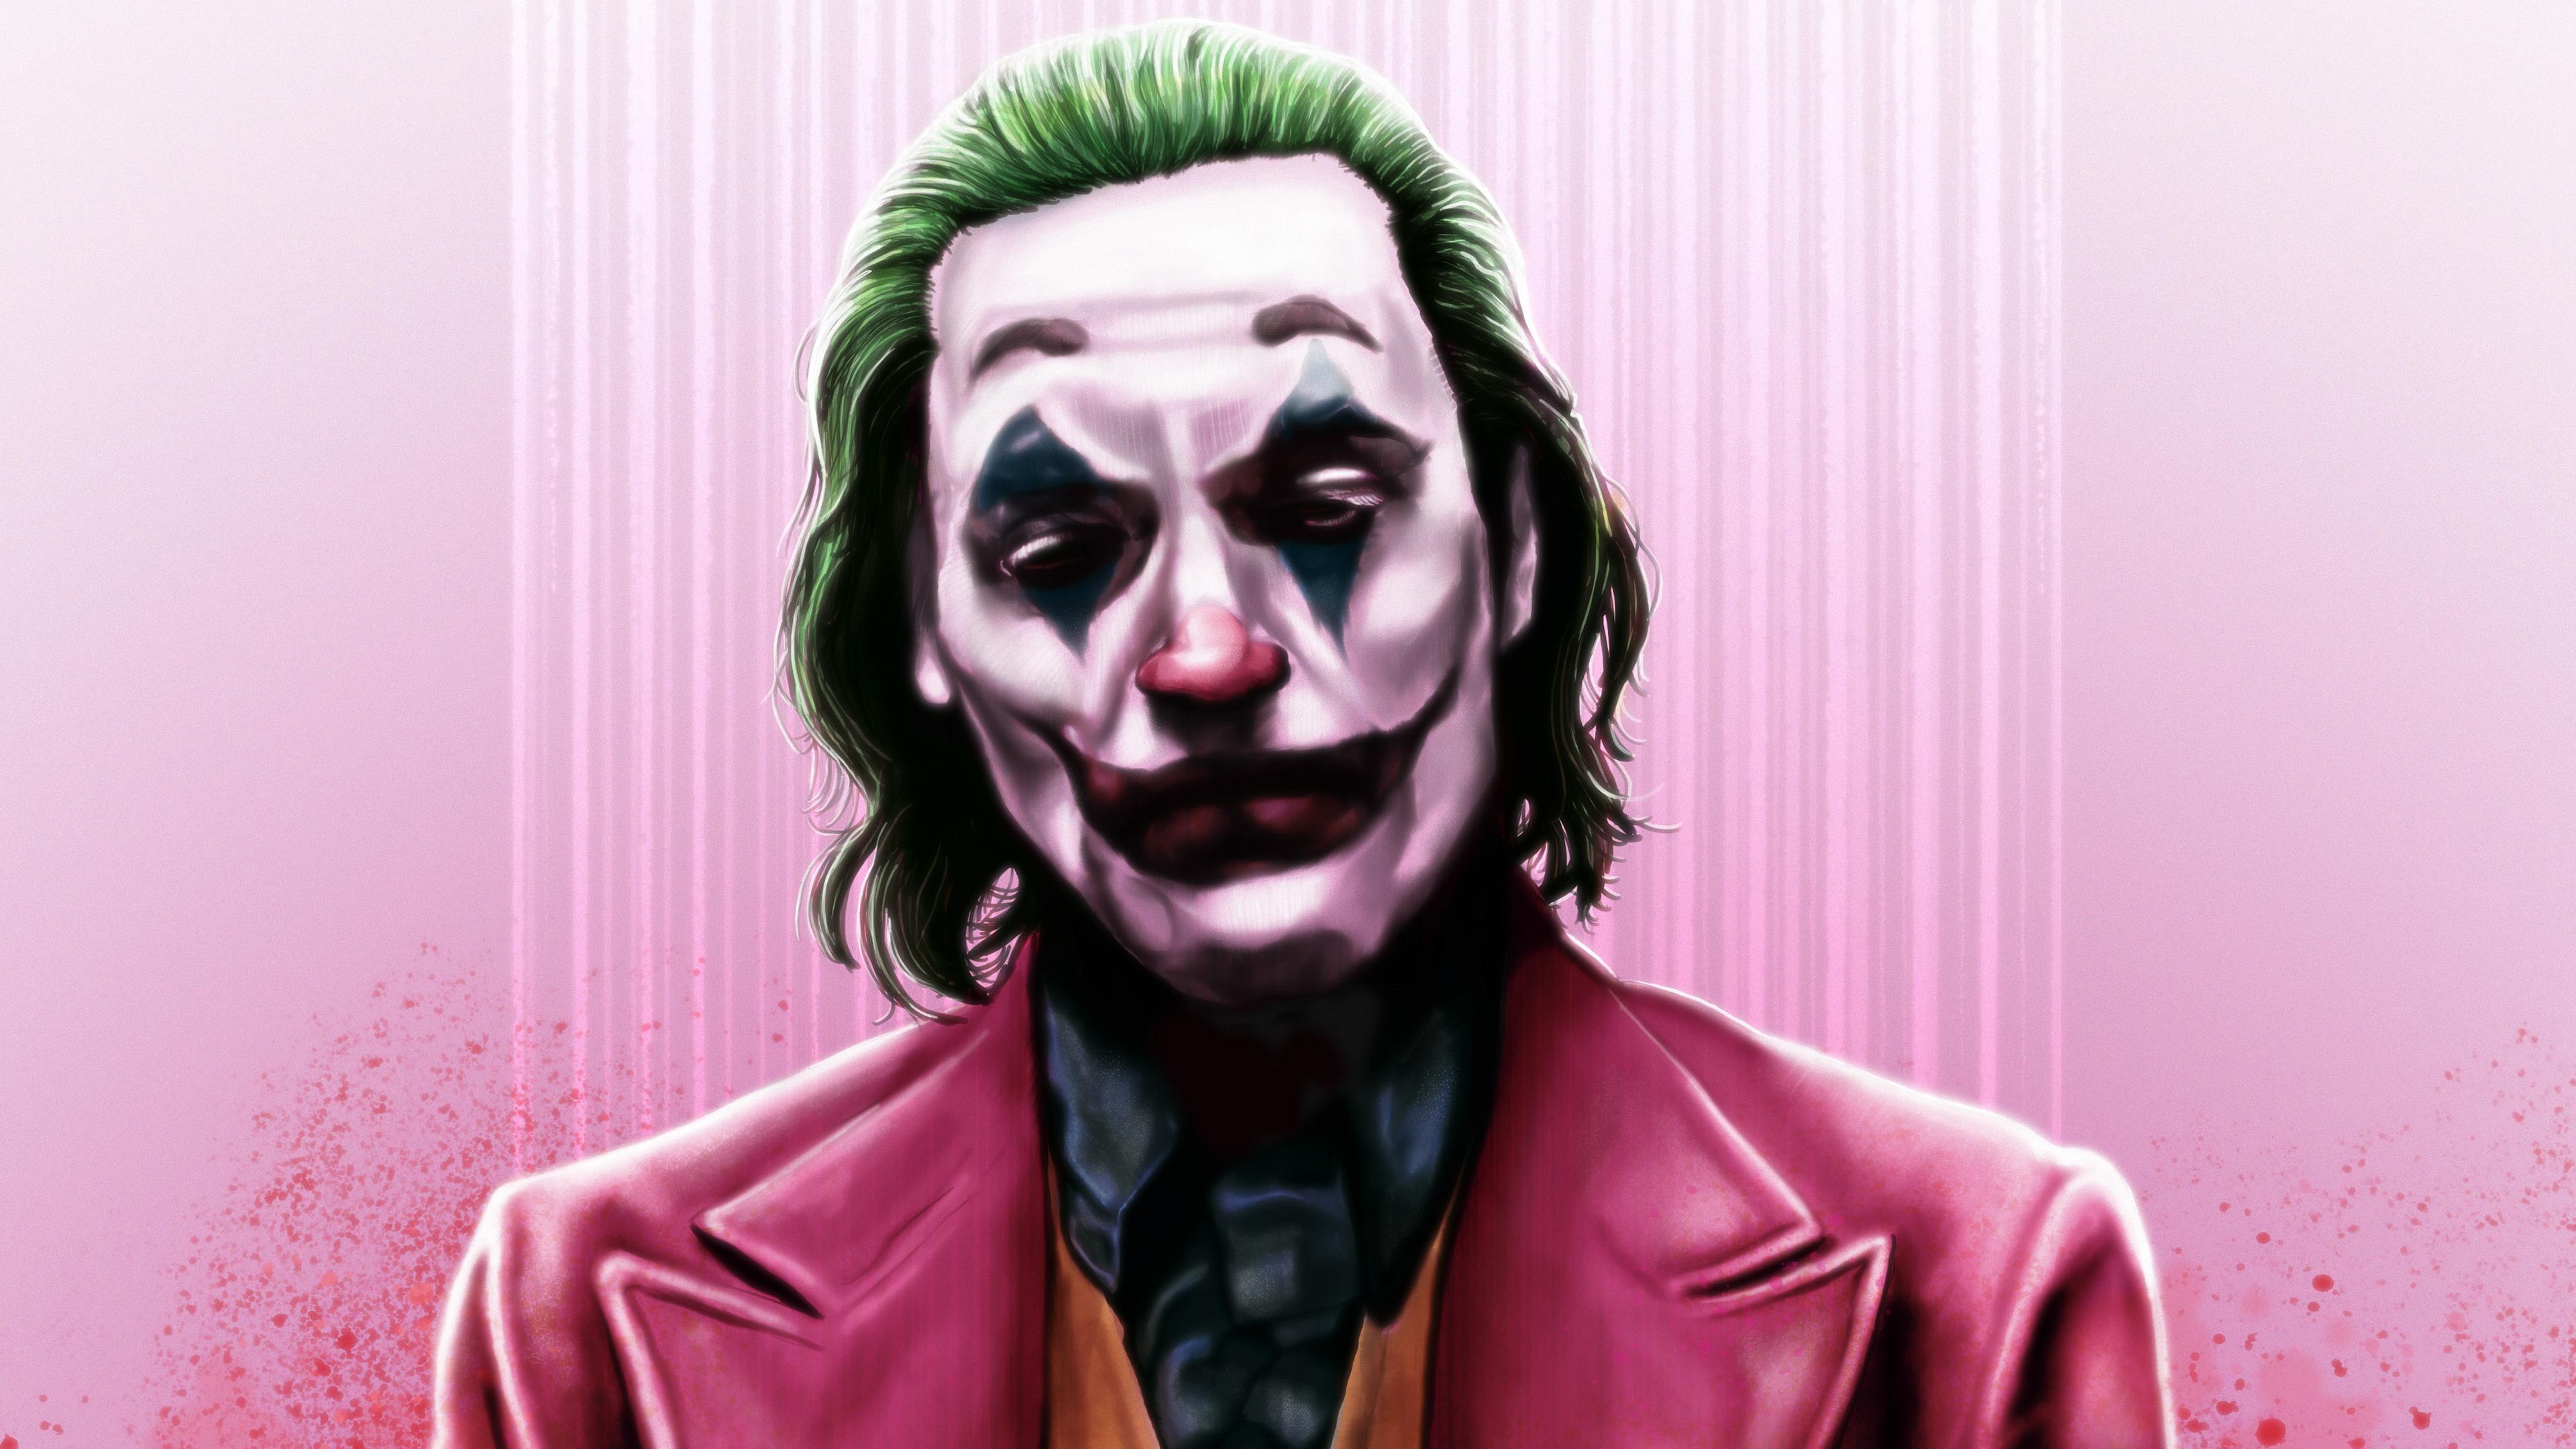 Wallpaper 4k Joker Joaquin Phoenix 4k Art 4k Wallpapers